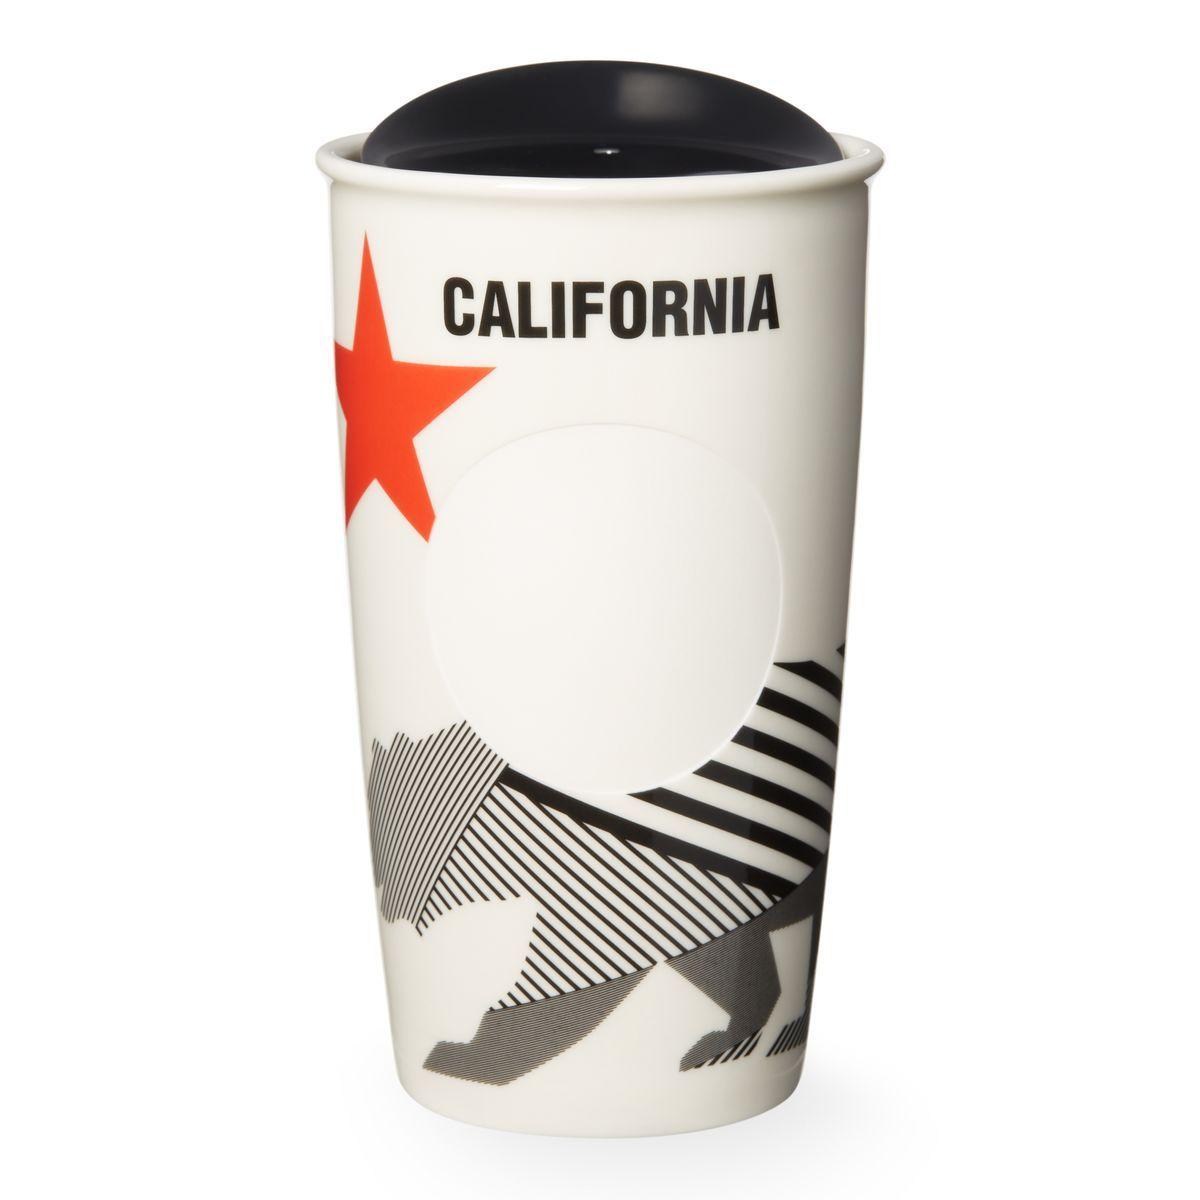 A Double Walled Ceramic Travel Mug